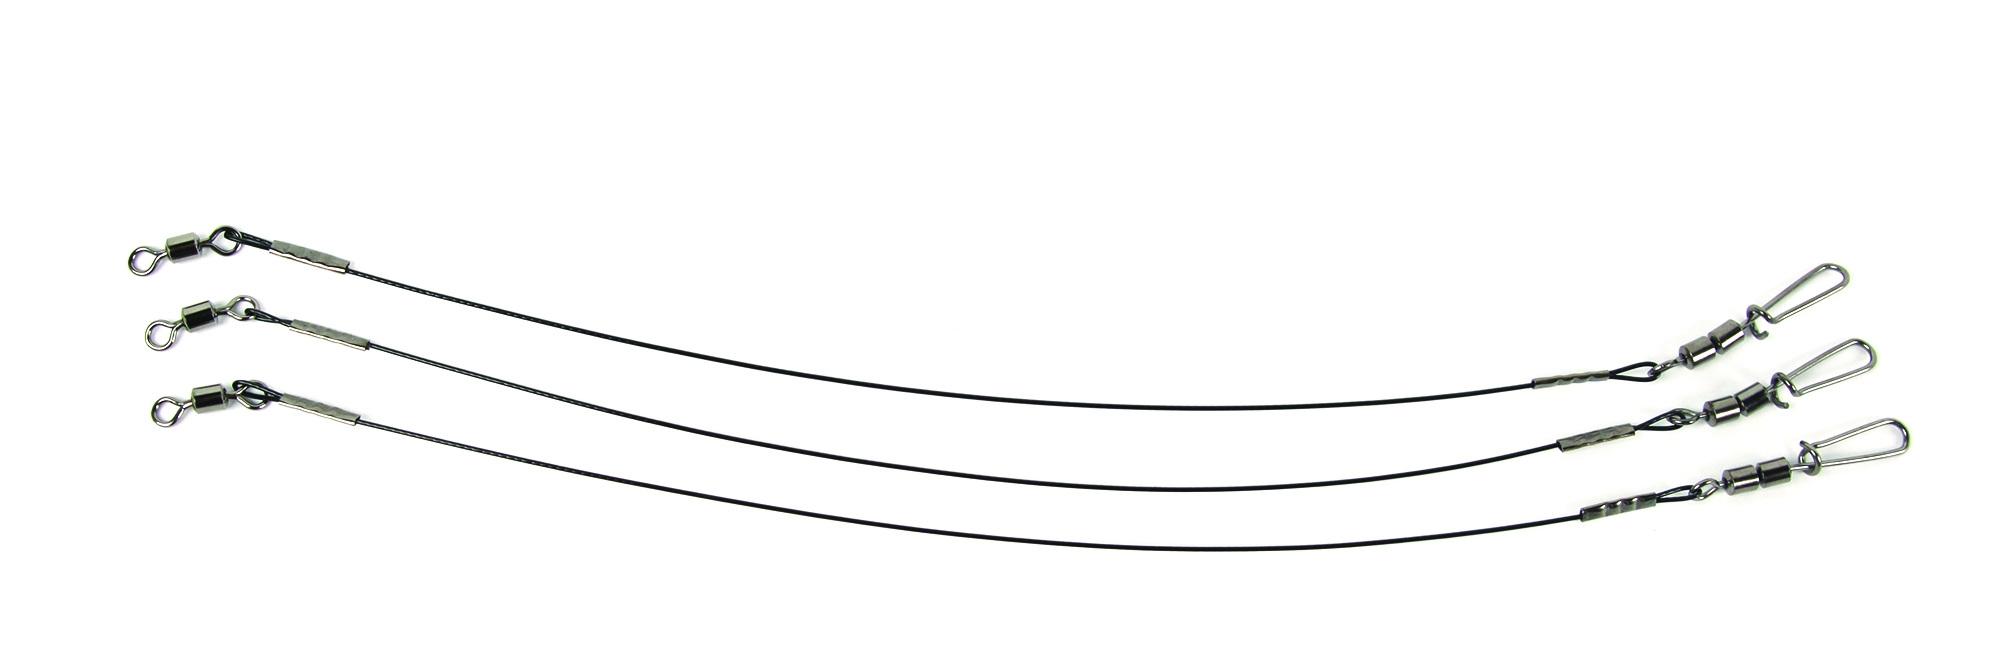 Peruke x-lock 18cm 20kg